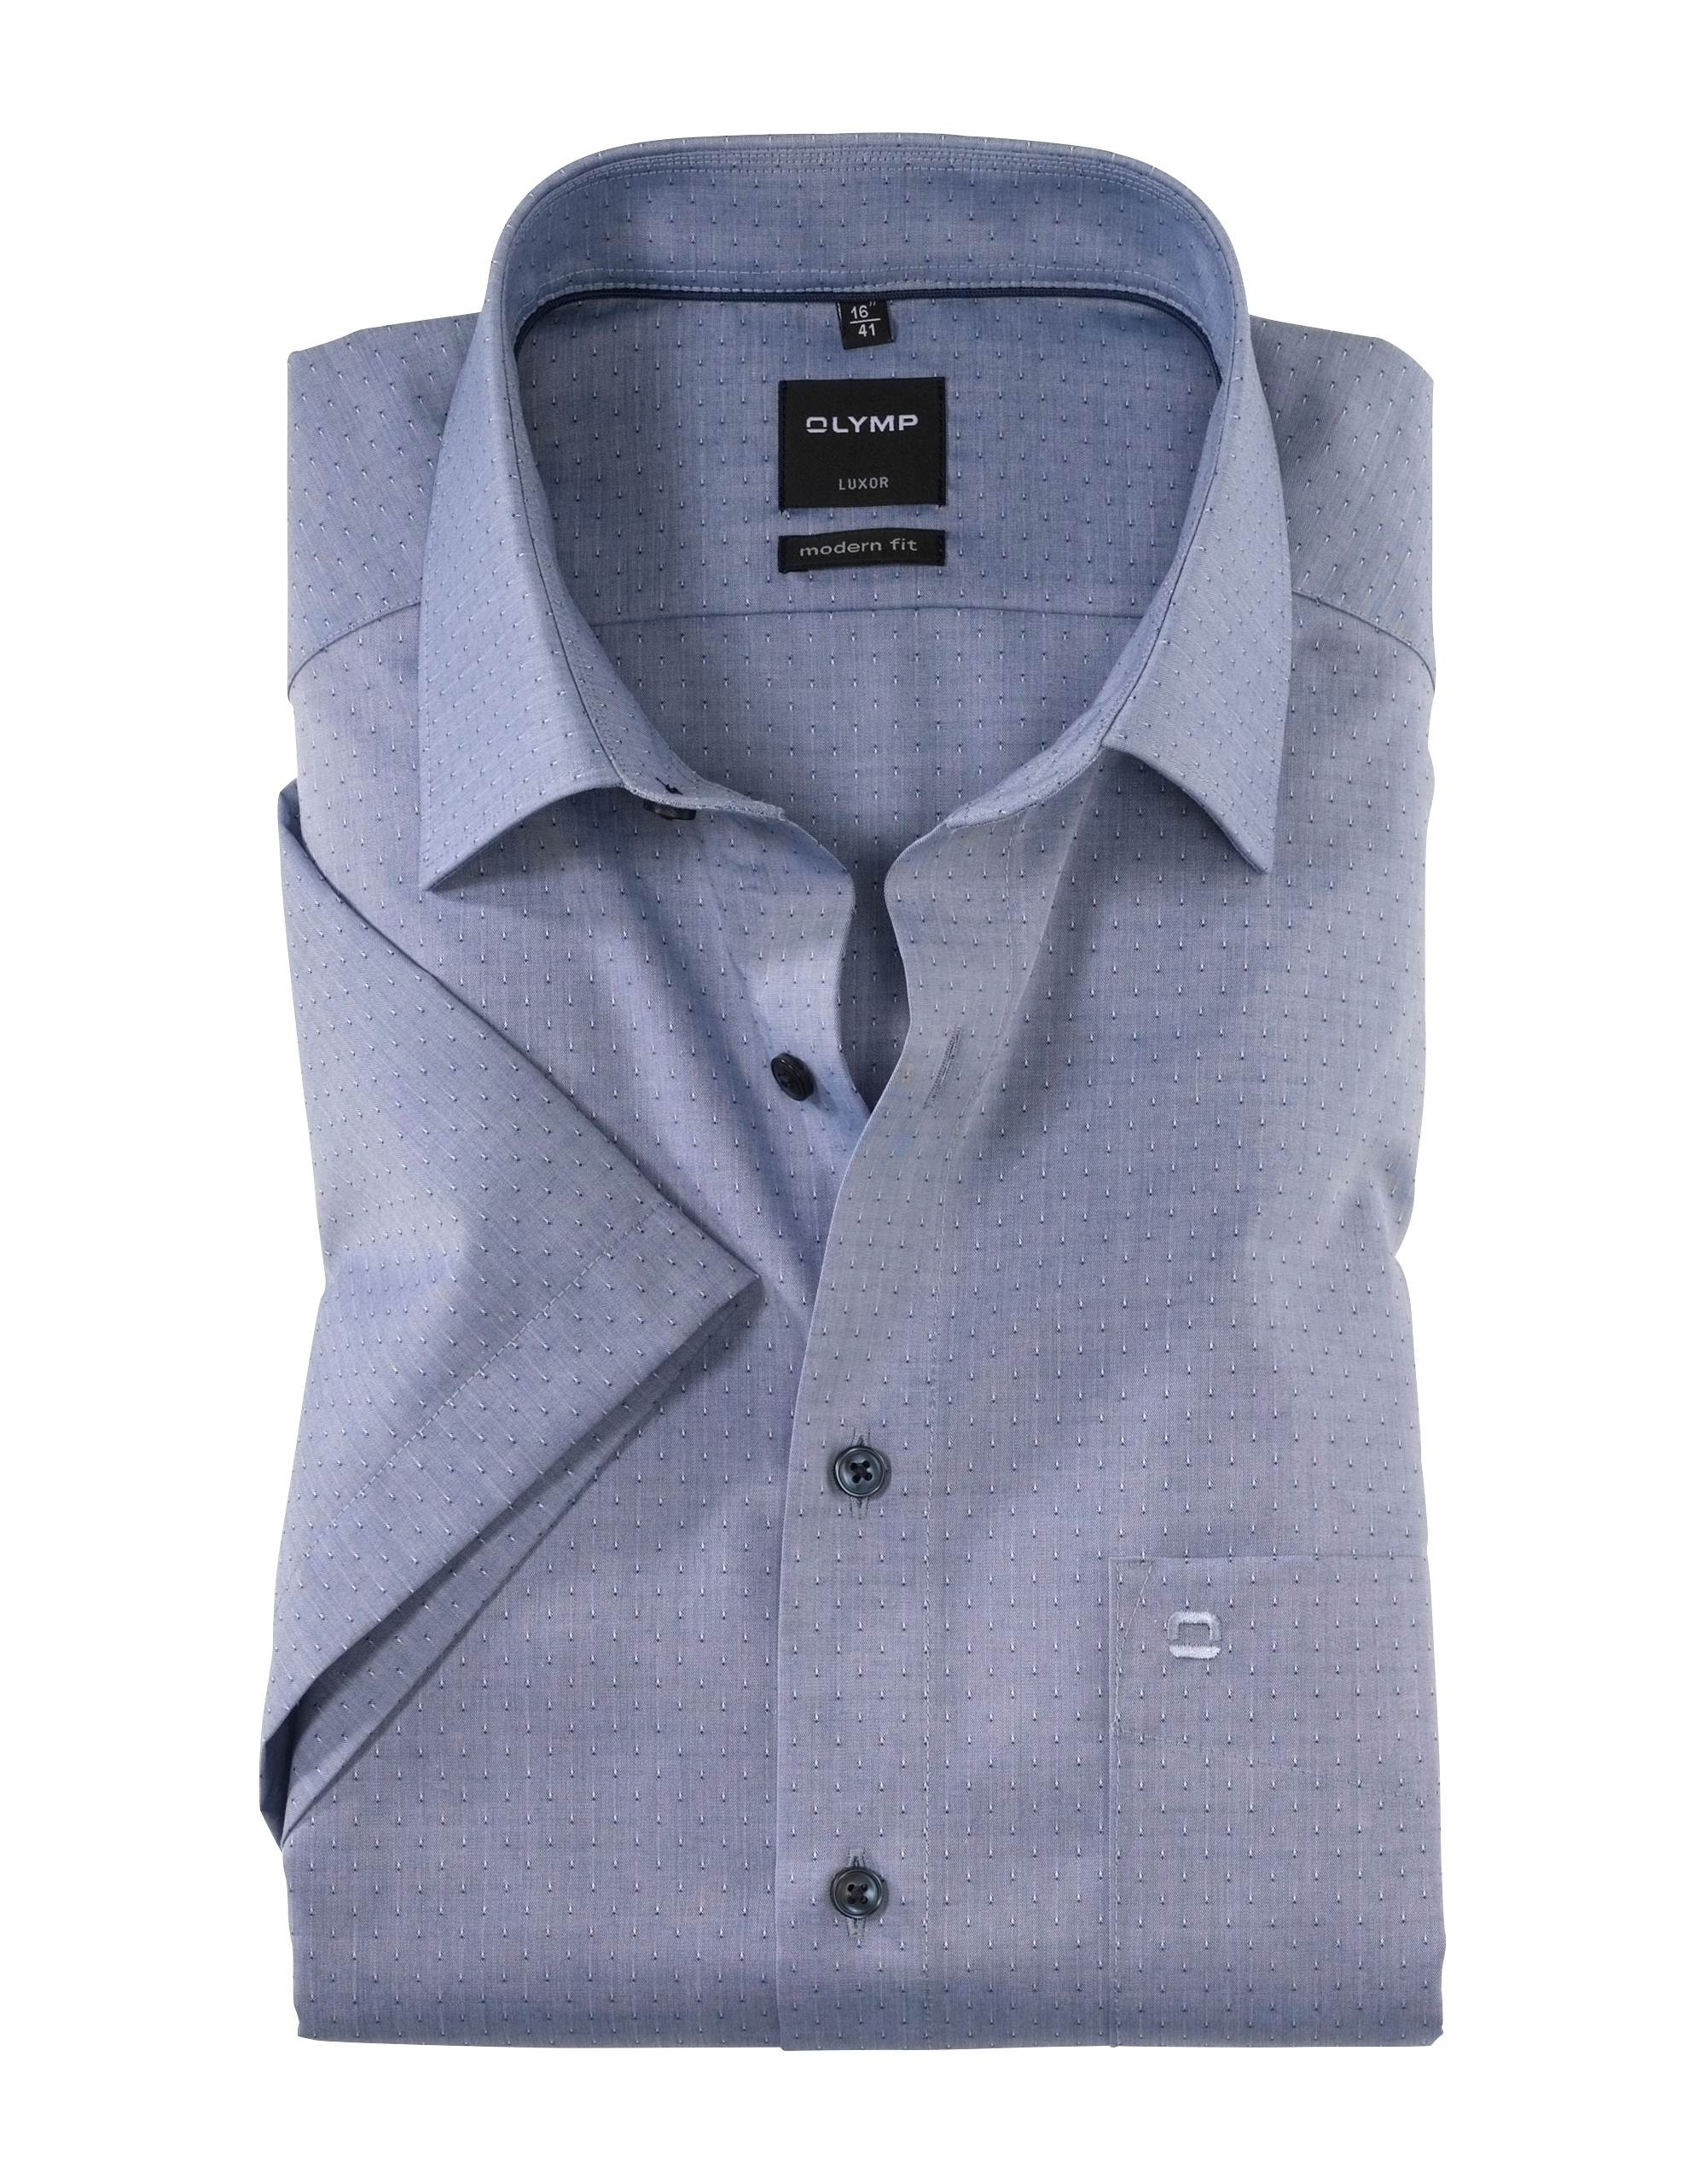 OLYMP Luxor Halbarmhemd, modern fit, New Kent, Marine, 45 | Bekleidung > Hemden > Sonstige Hemden | Marine | 100% baumwolle | OLYMP Luxor